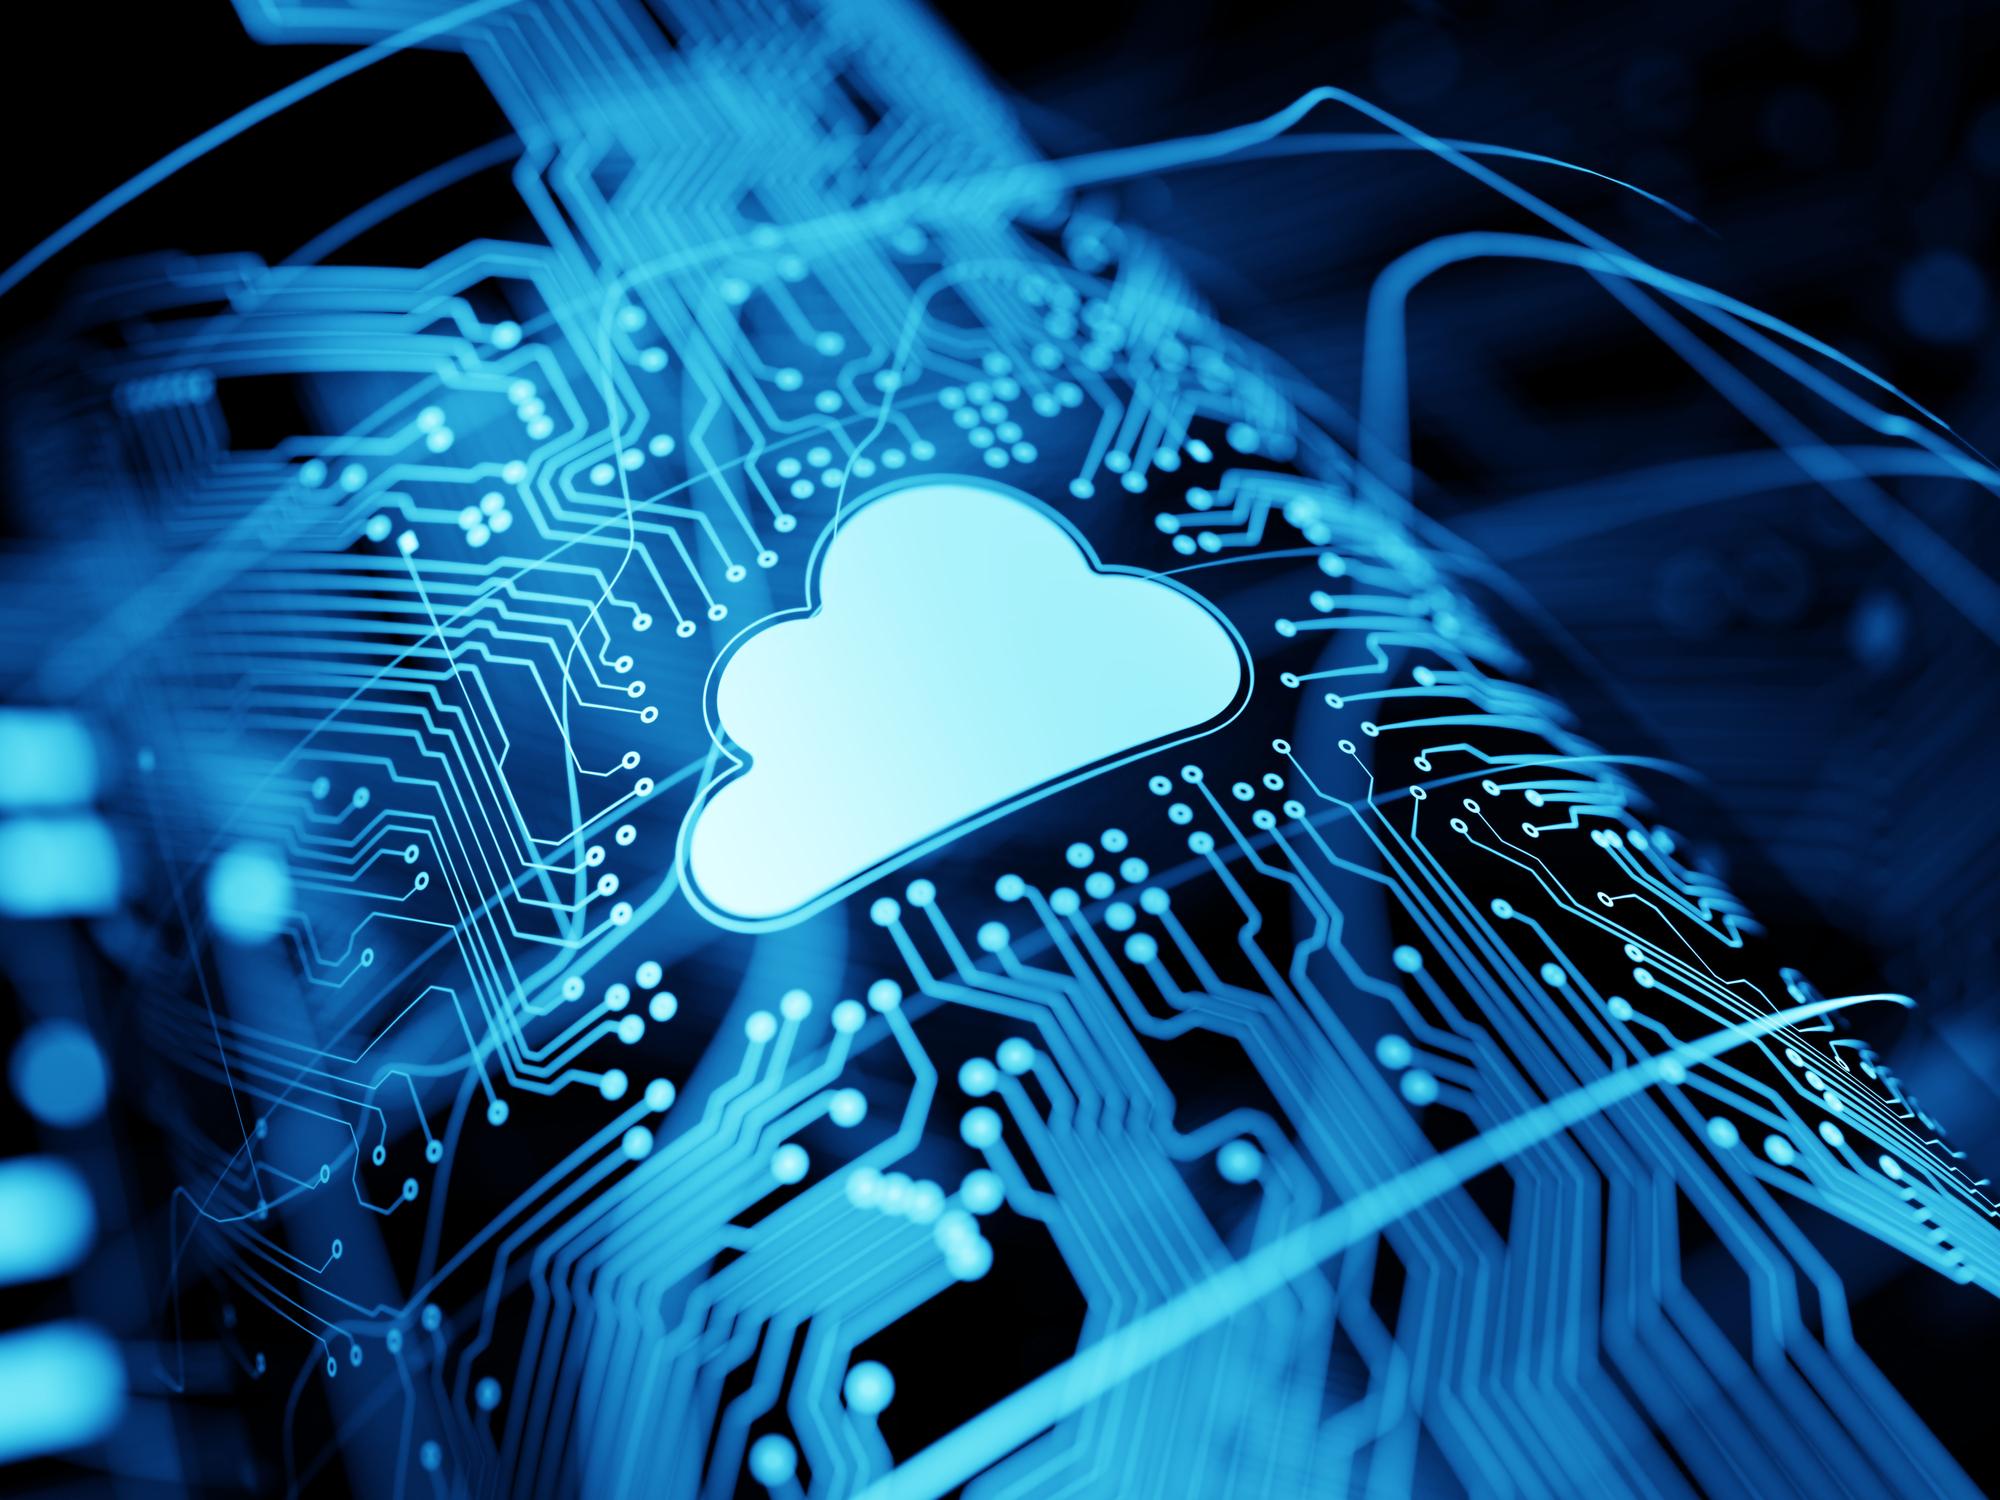 CyberArk Software Revenue Jumps 36%